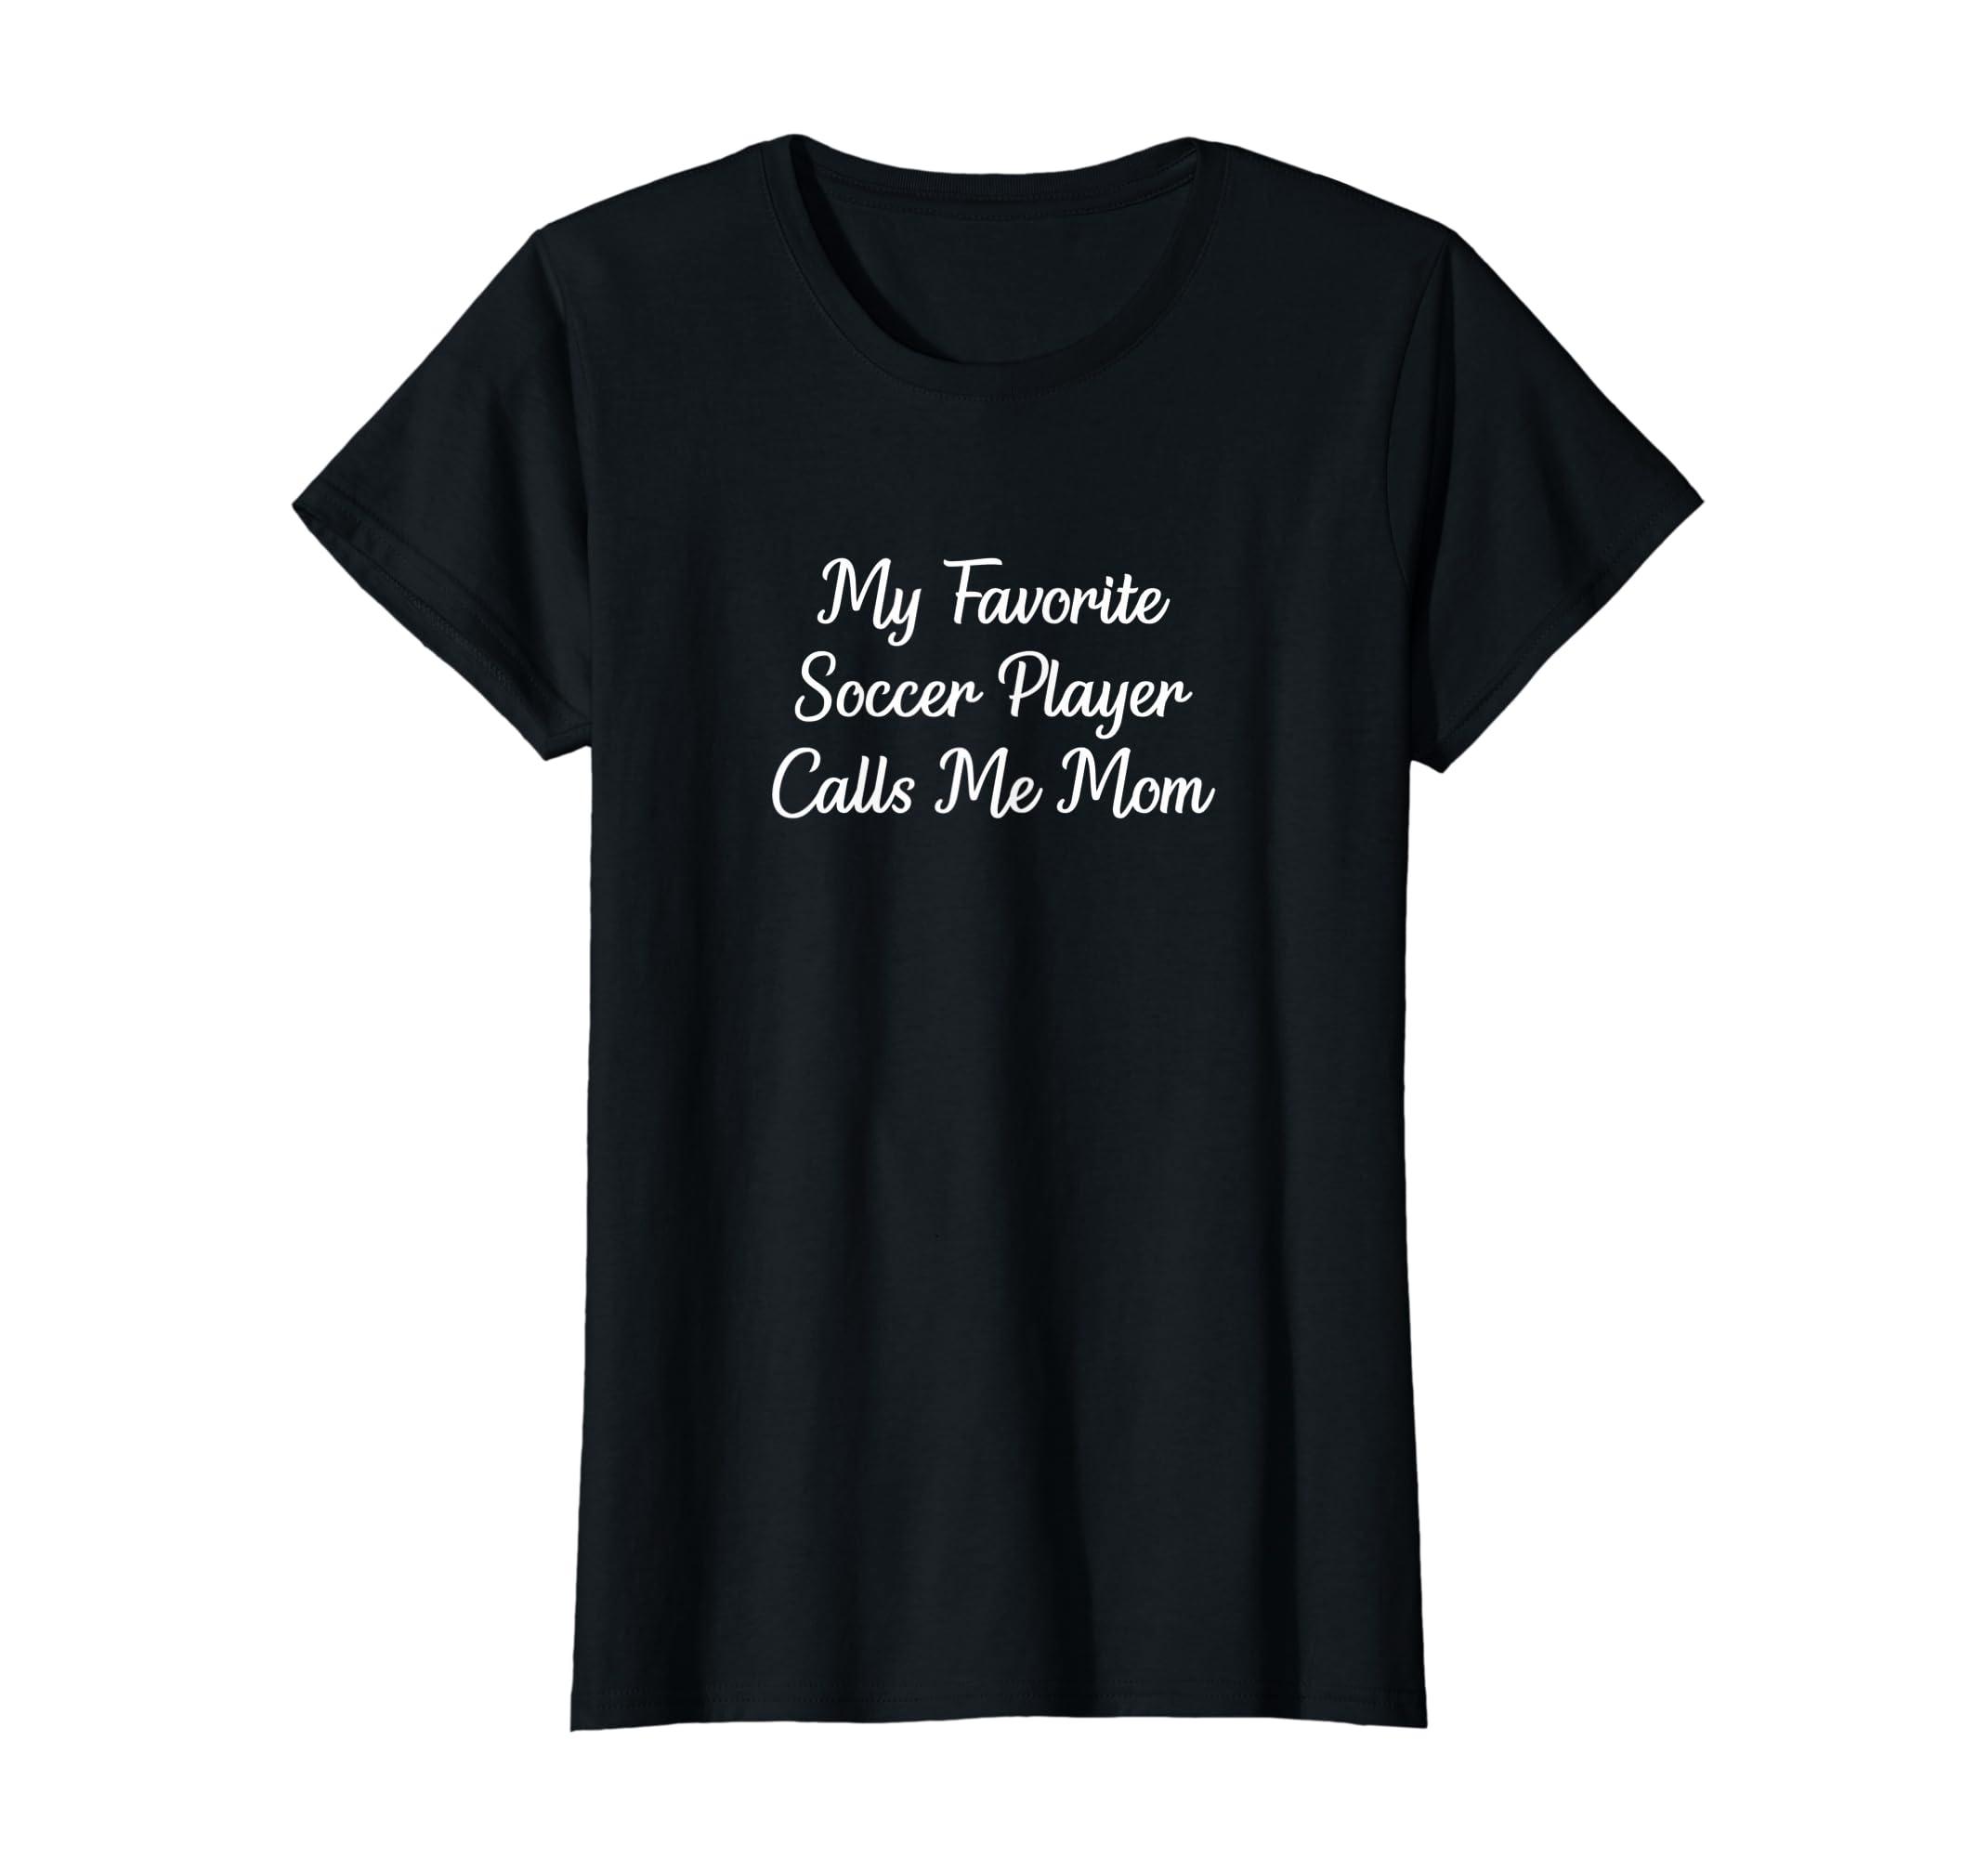 My Favorite Soccer Player Calls Me Mom T-shirt